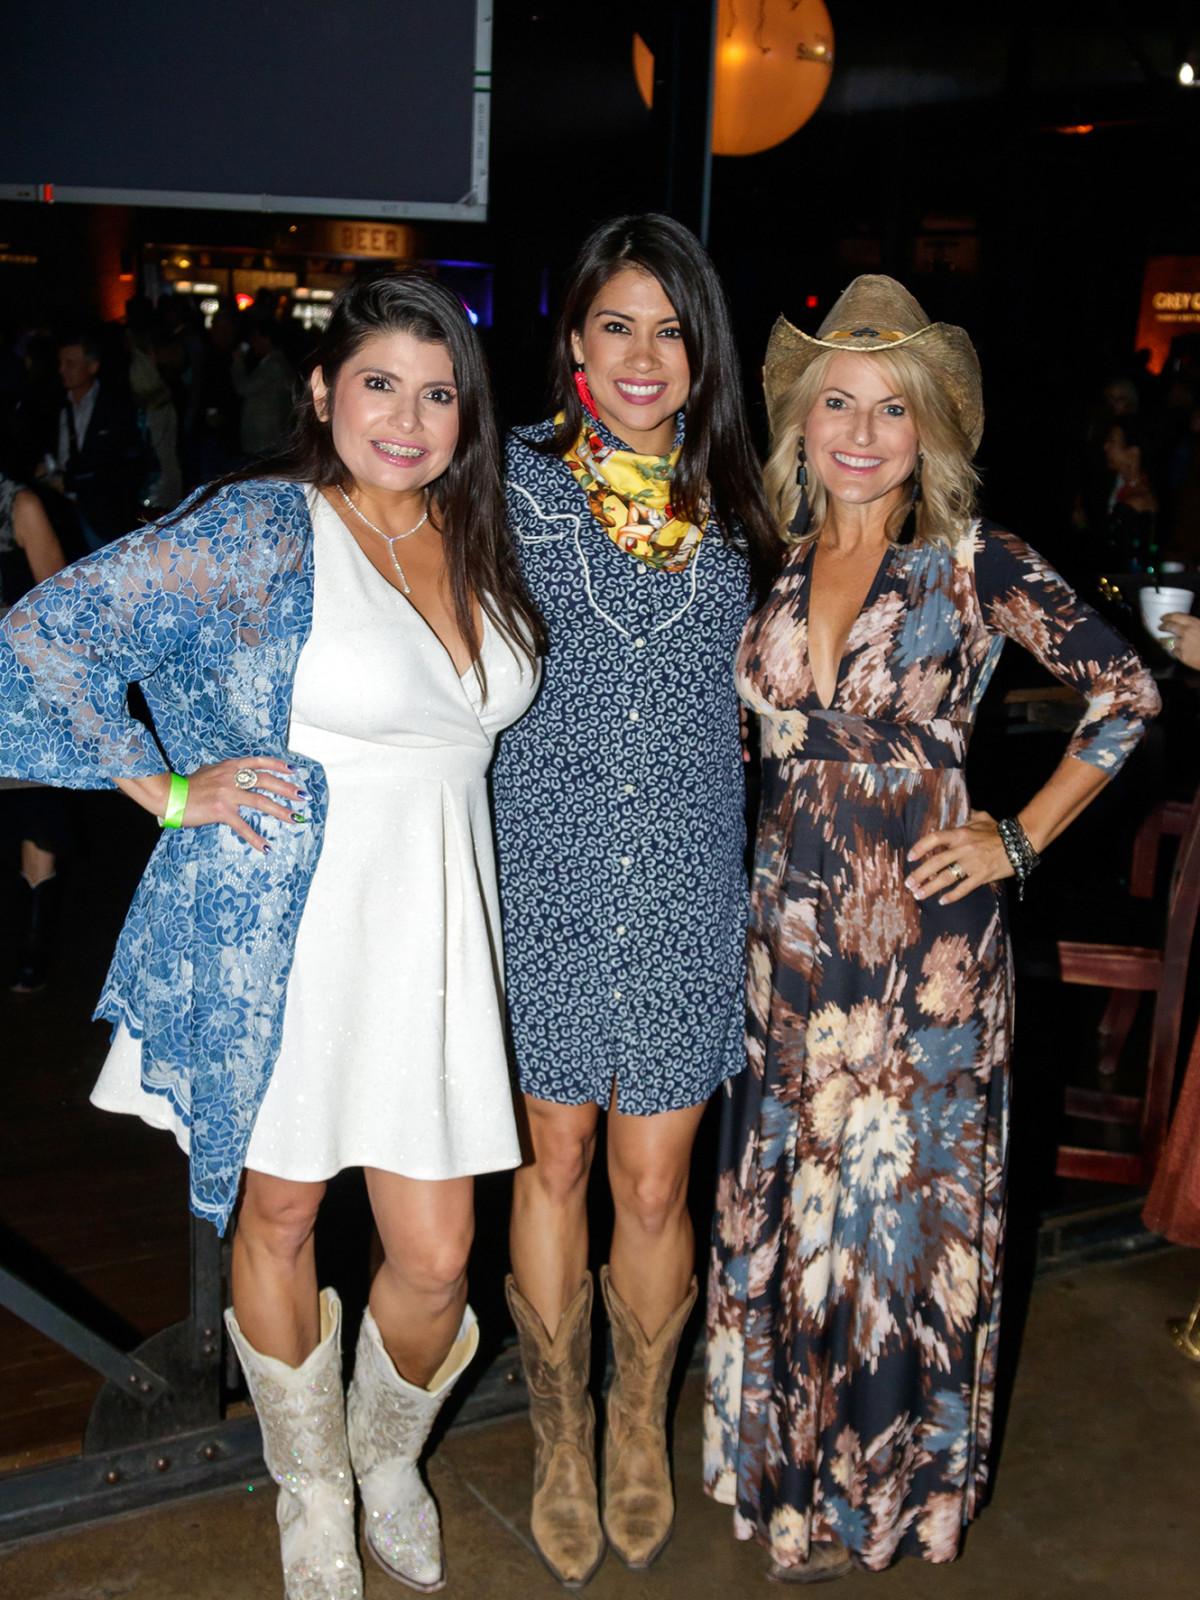 6.Christina Morgan, Jacqueline Garcia, Rafaella Smith